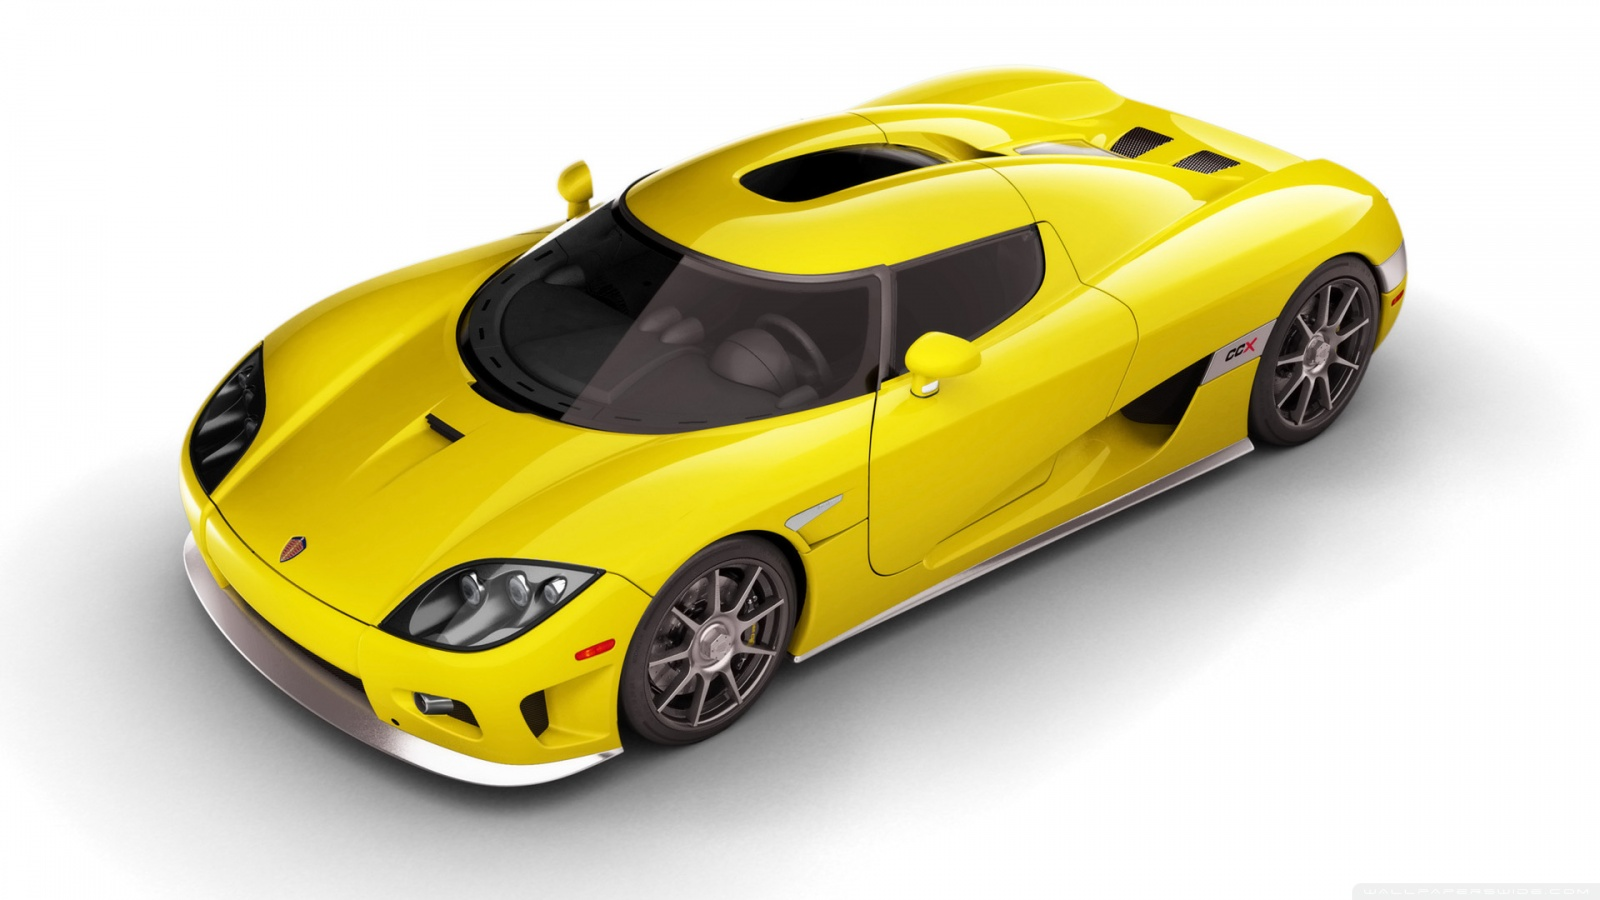 2006 Koenigsegg CCX Yellow Top HD desktop    Widescreen HD Wallpaper